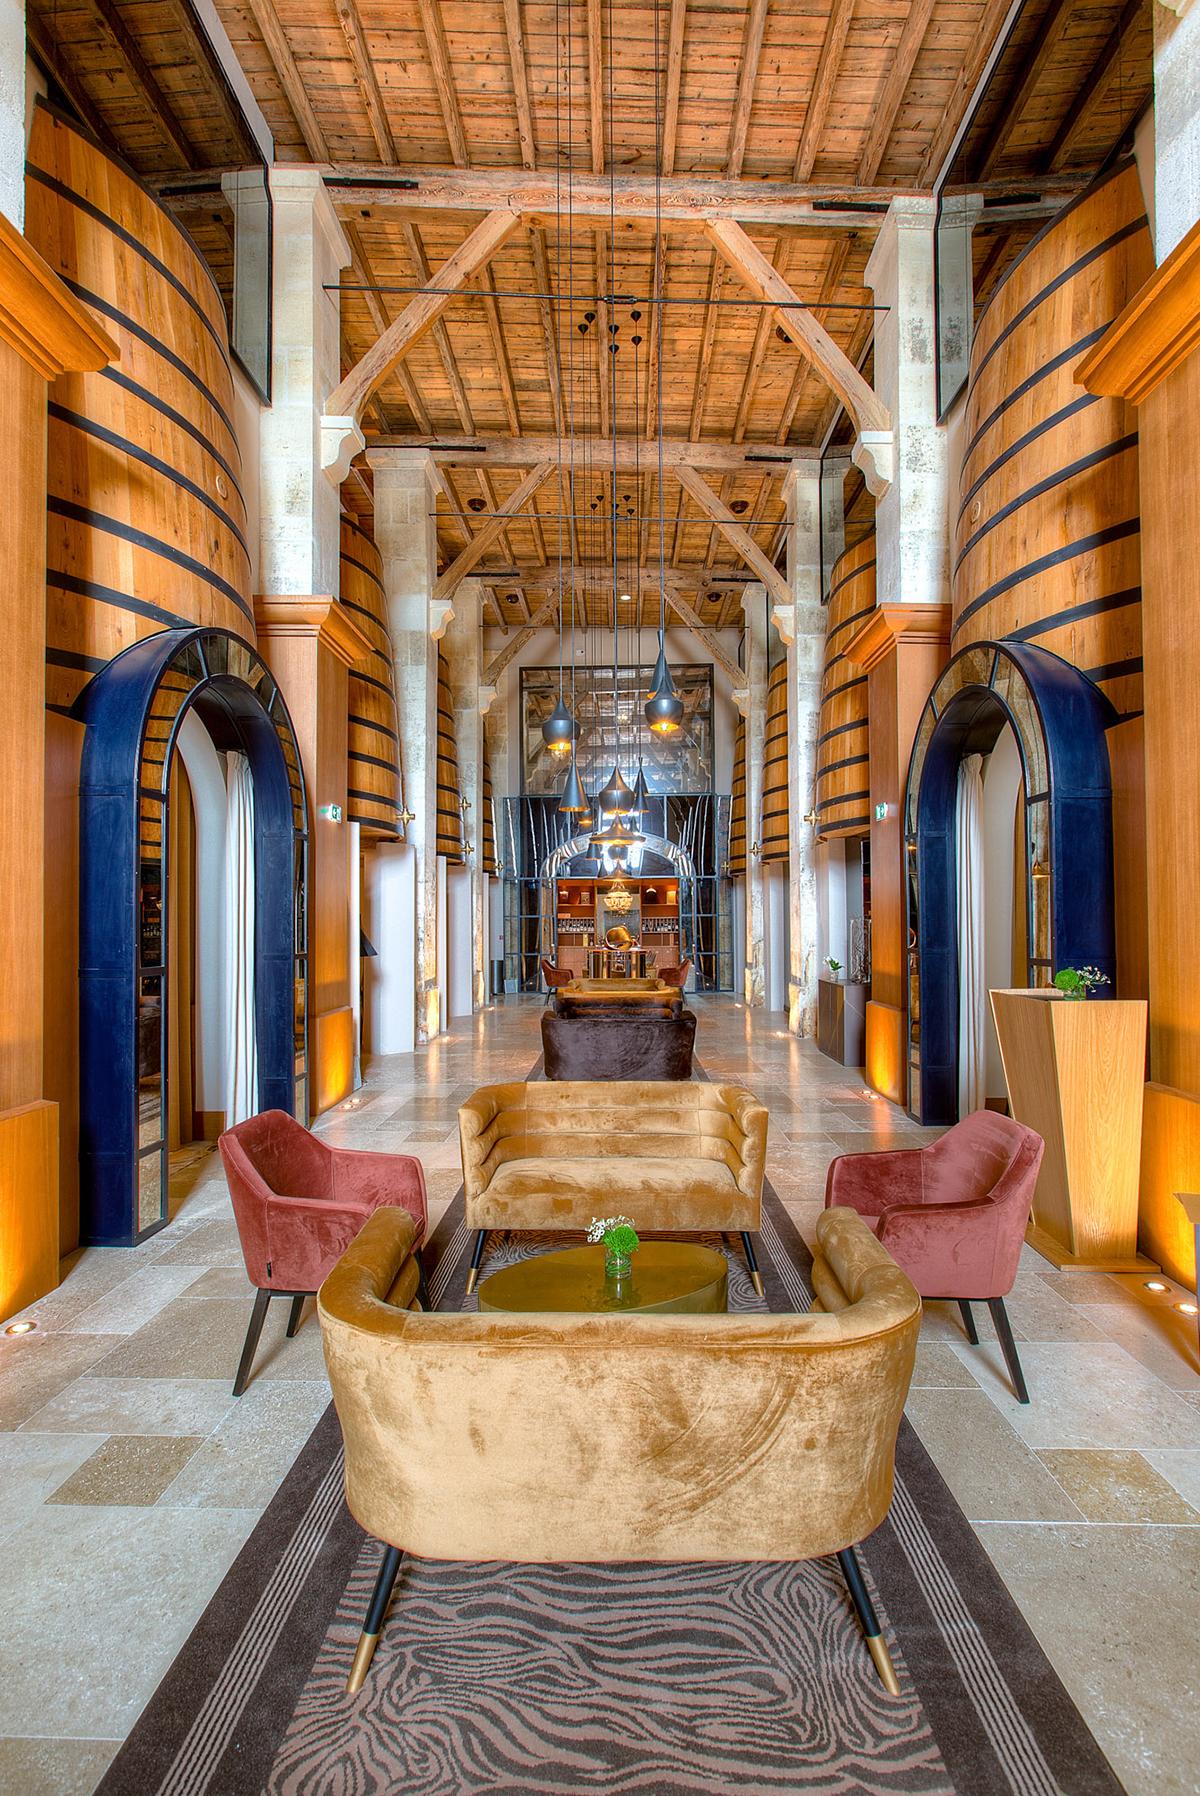 Luxurious restaurant interiors